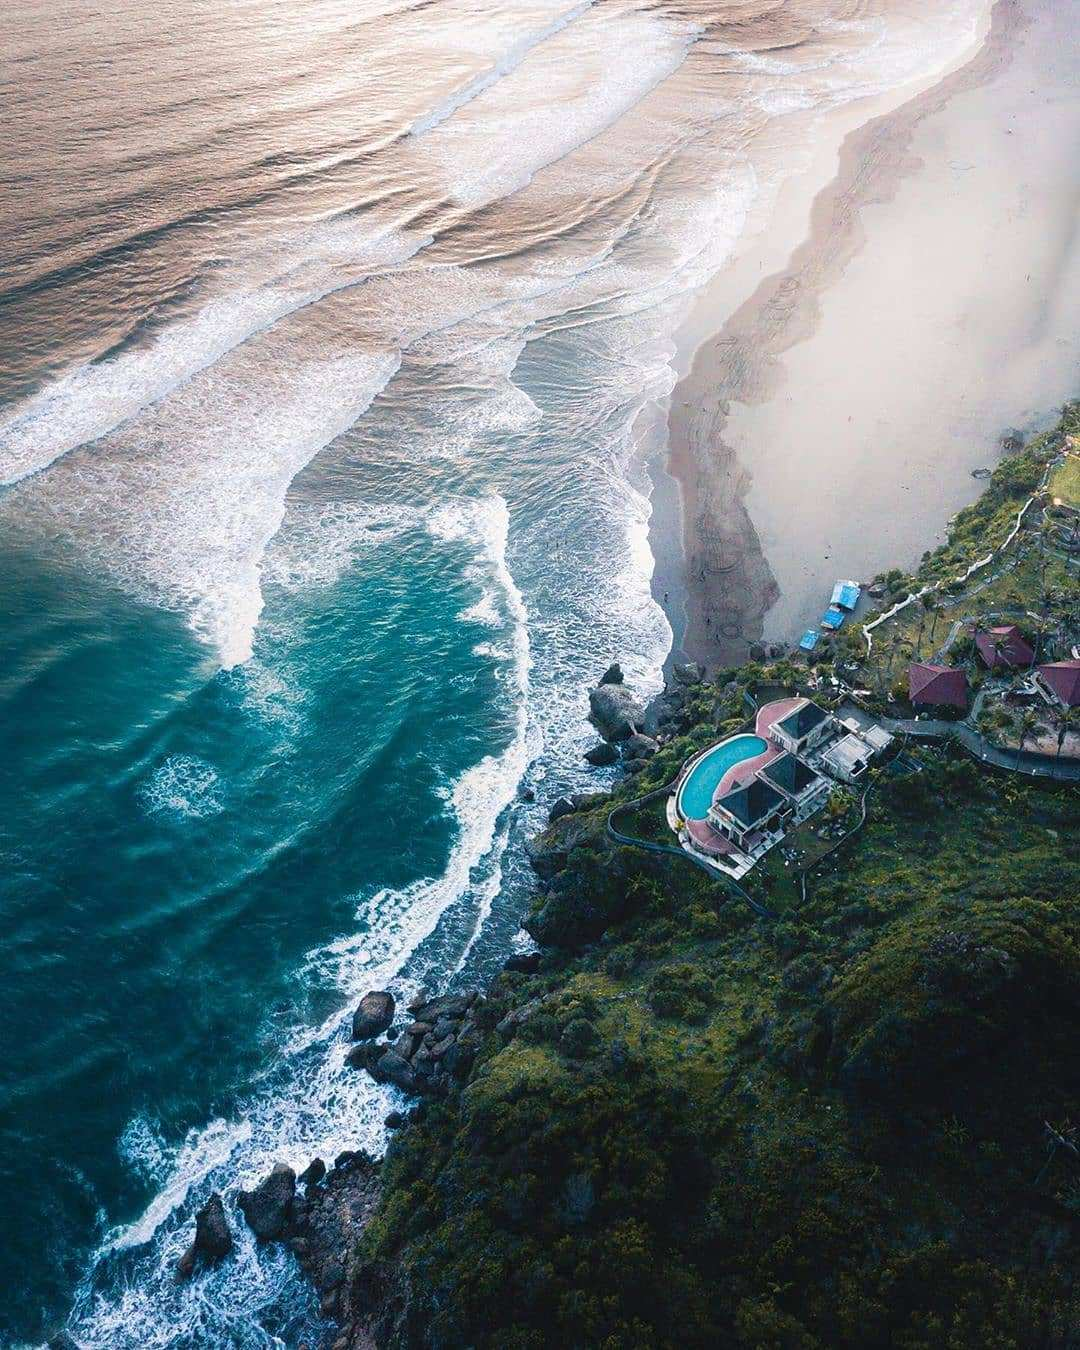 Pantai Parangtritis Dilihat Dari Atas, Image From @fajarnasution